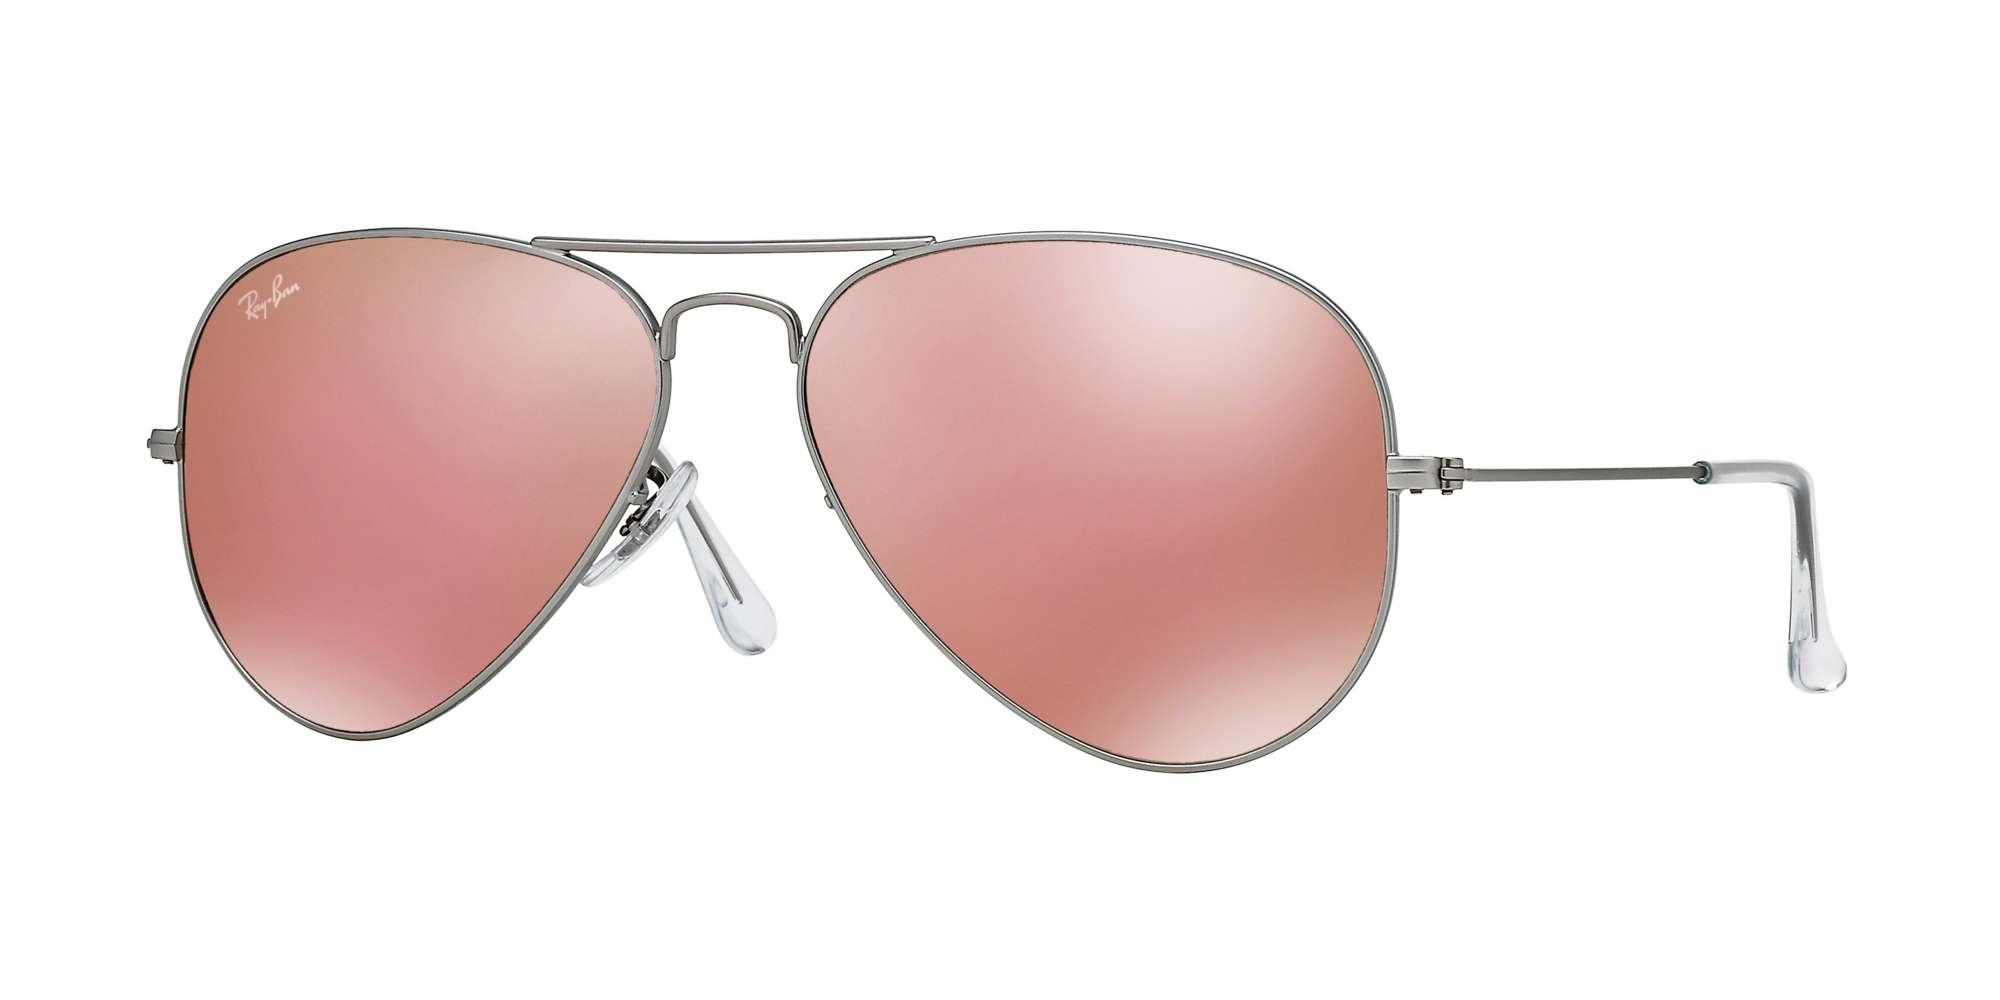 MATTE SILVER / BROWN MIRROR PINK lenses